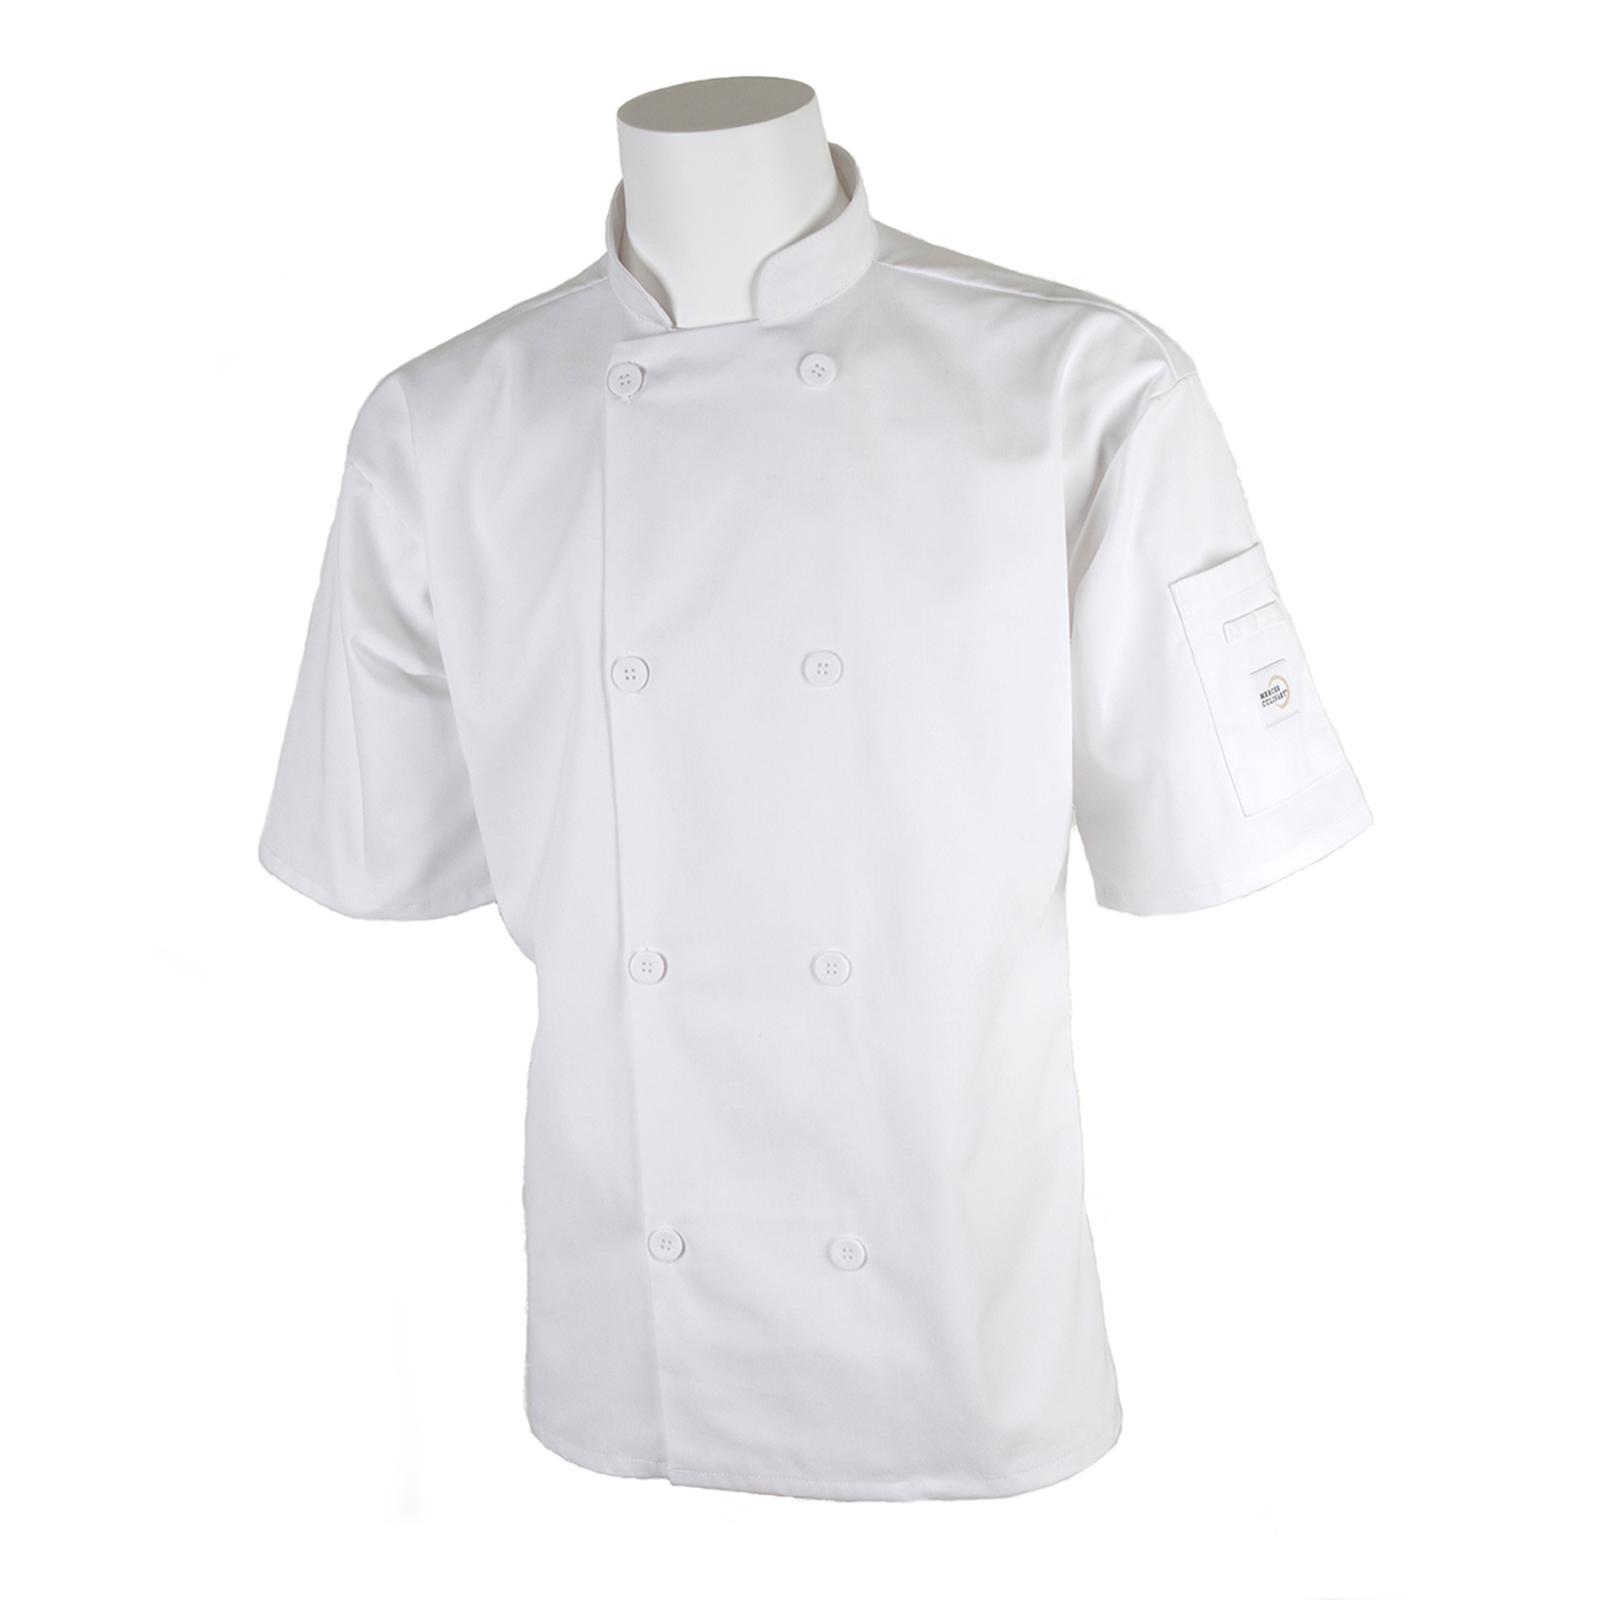 Mercer Culinary M60019WHM chef's coat